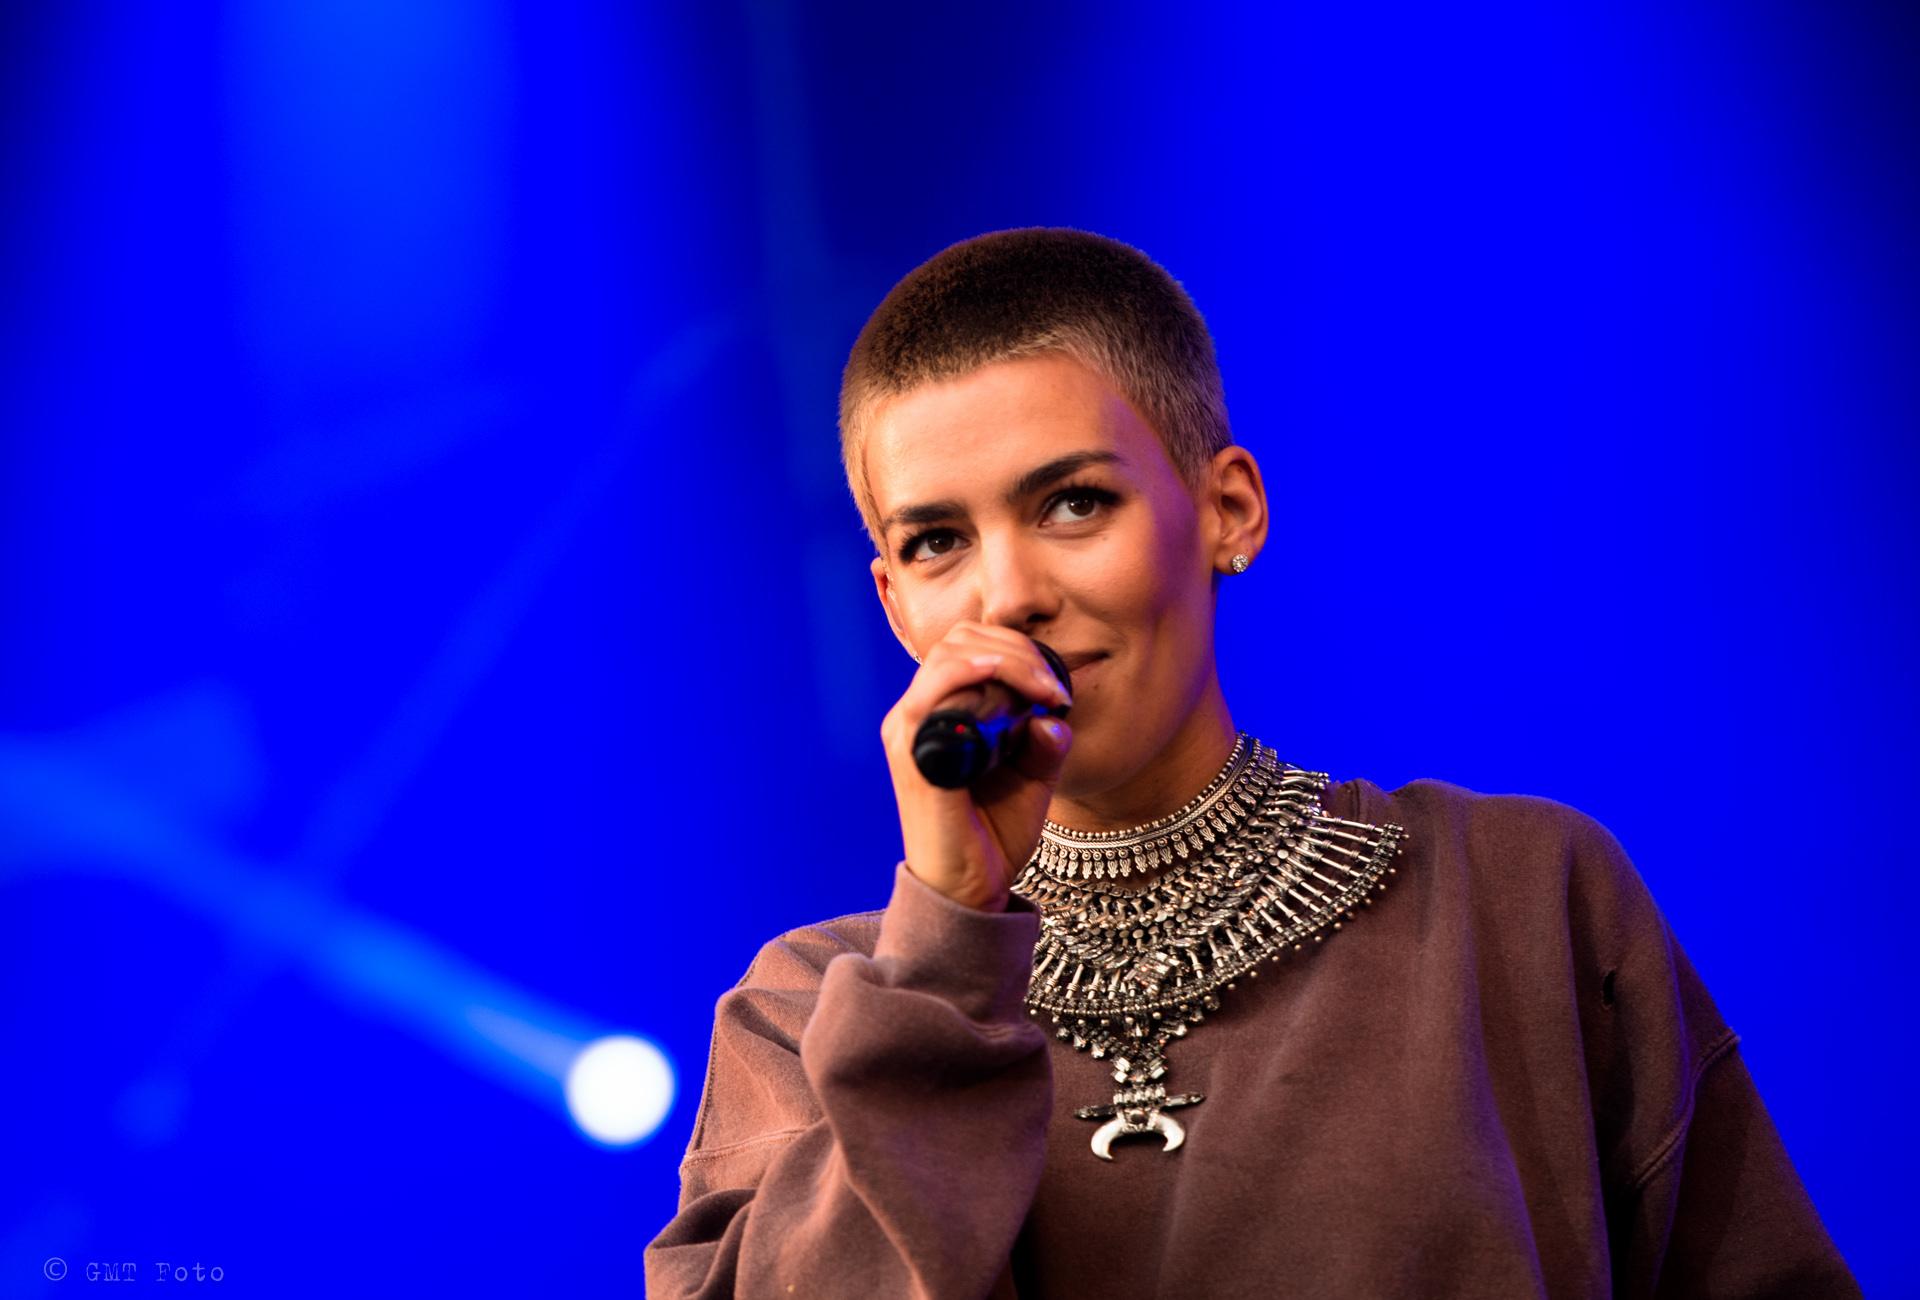 Frida Gold Kieler Woche 2016 Hörn